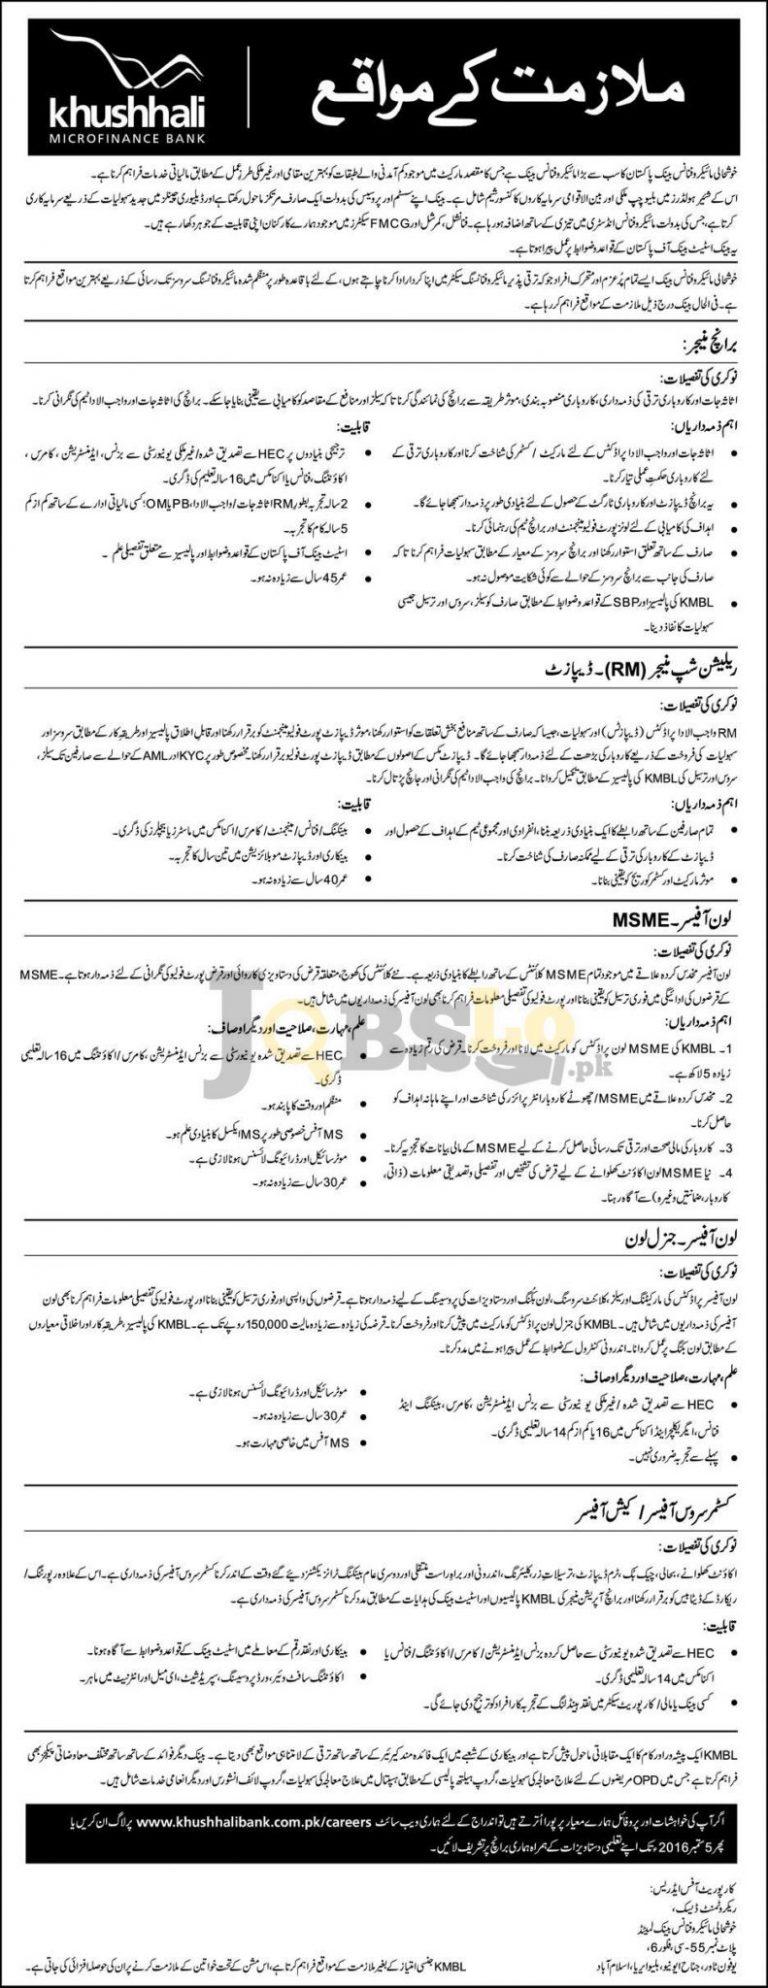 Khushhali Bank Jobs 2016 Pakistan KBL Latest Add Online Apply